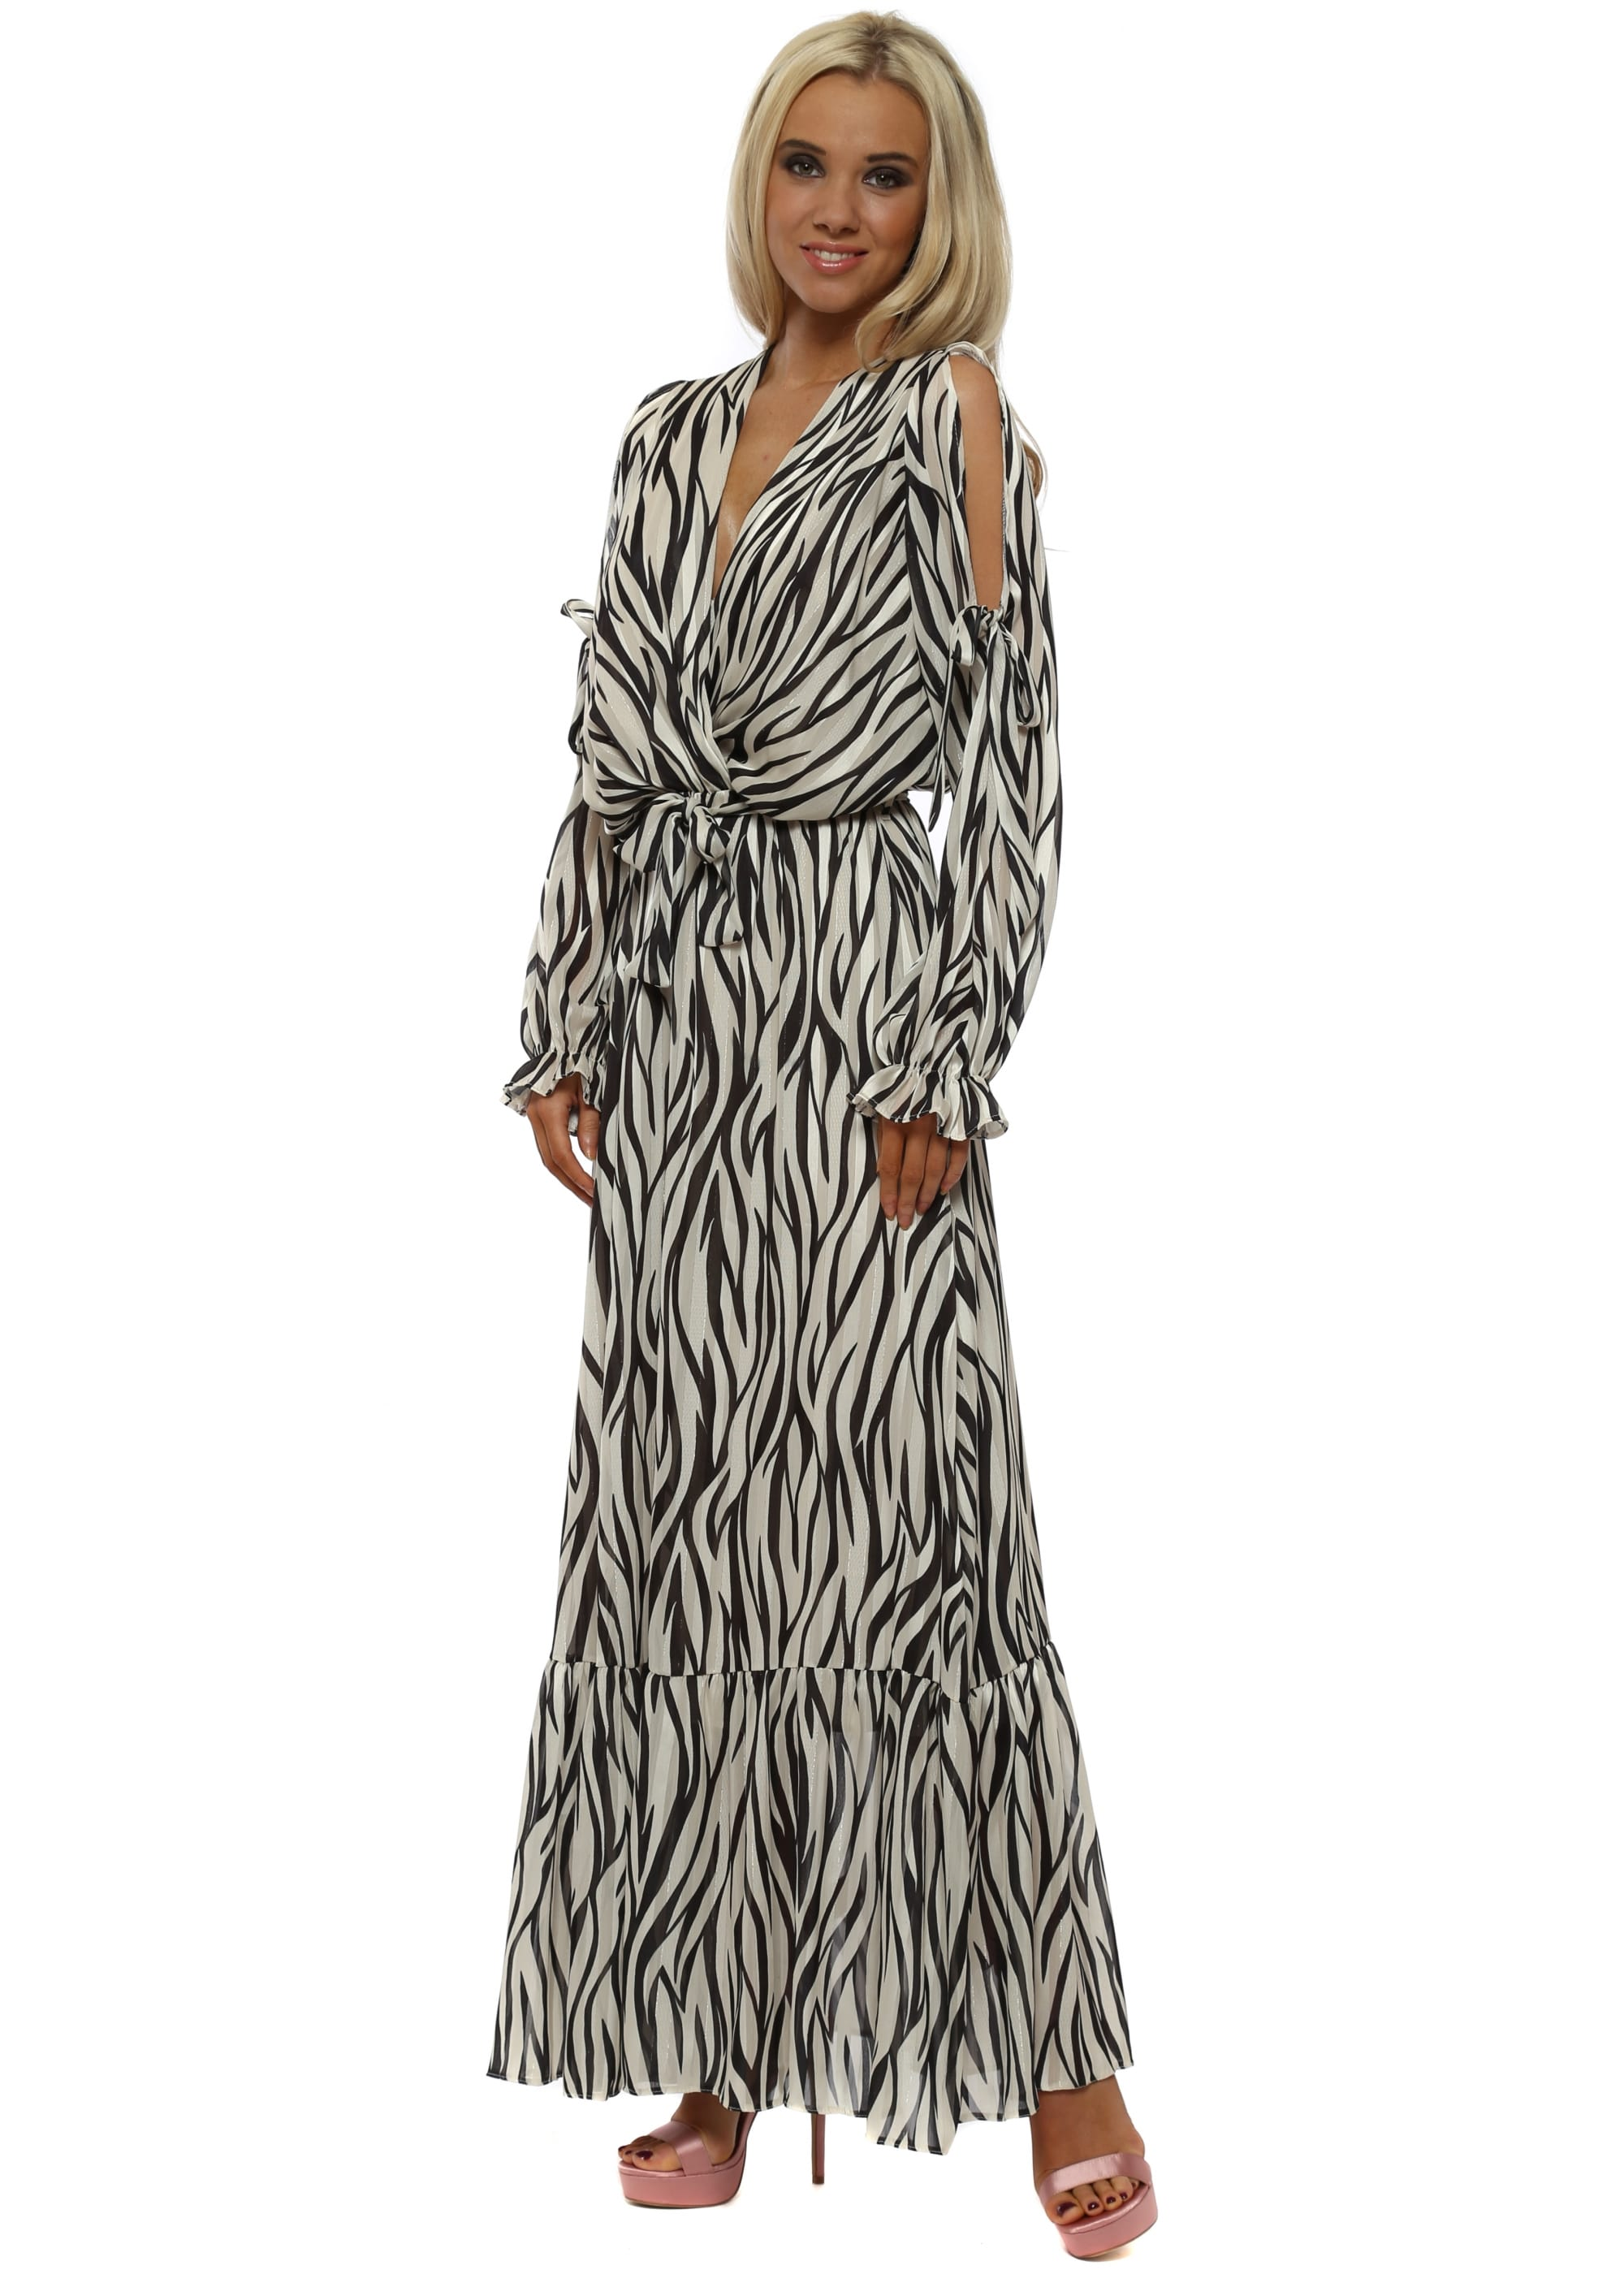 Fashion style Print zebra maxi dresses for lady